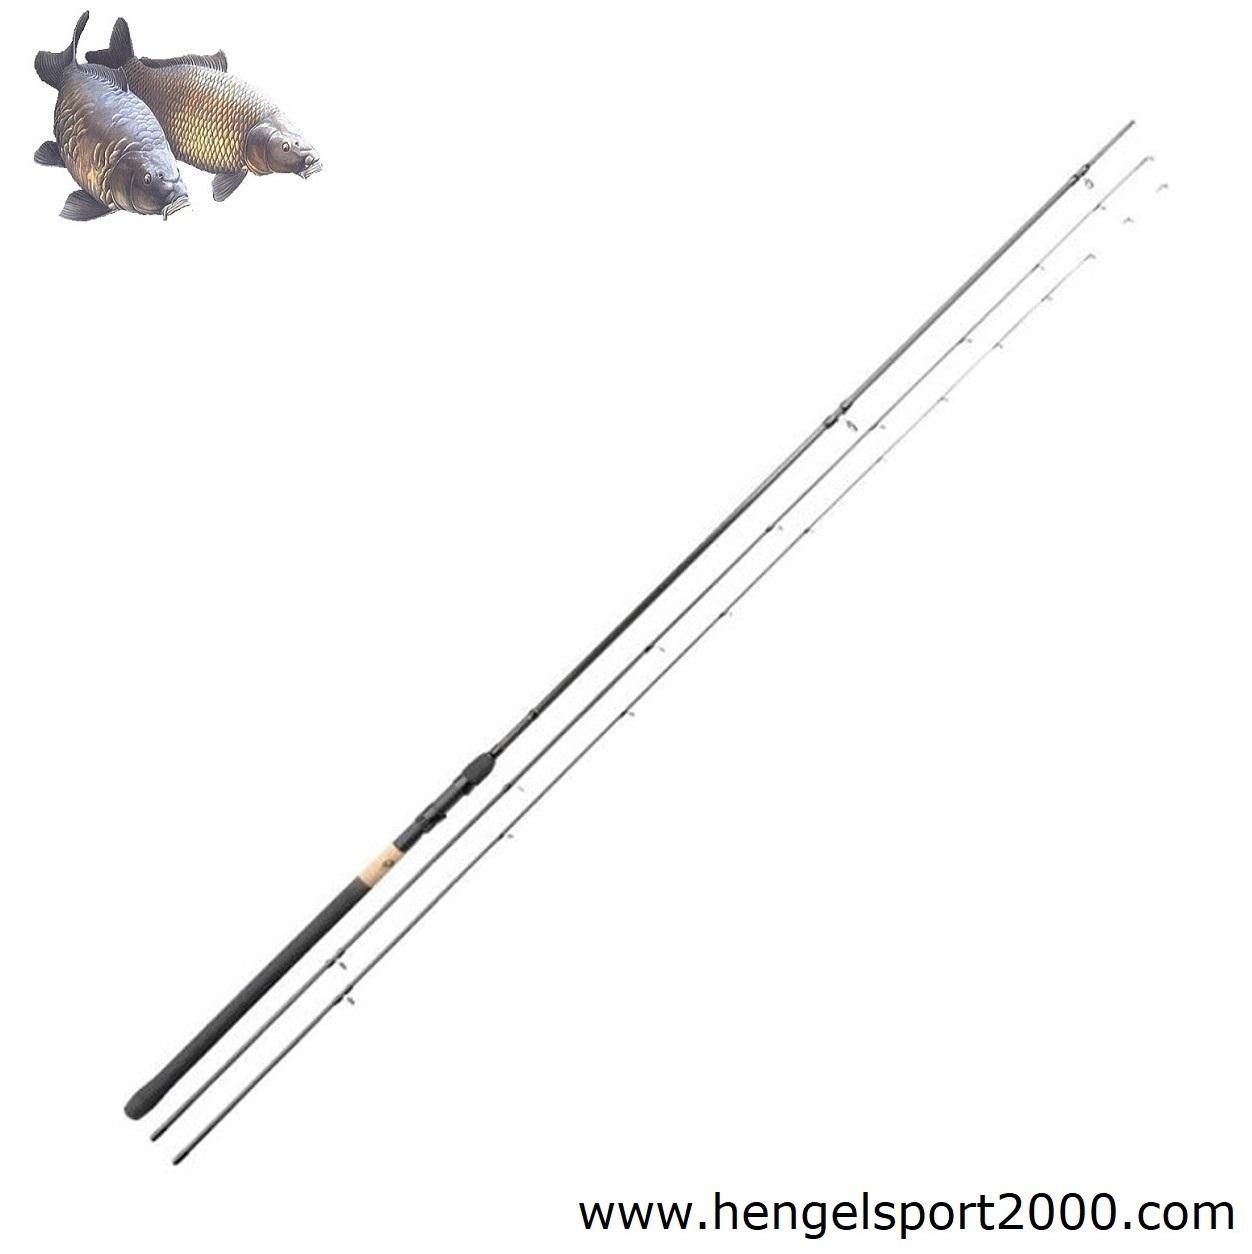 Prologic MP Detek Twin Tip Rod 10ft - 1,75lbs